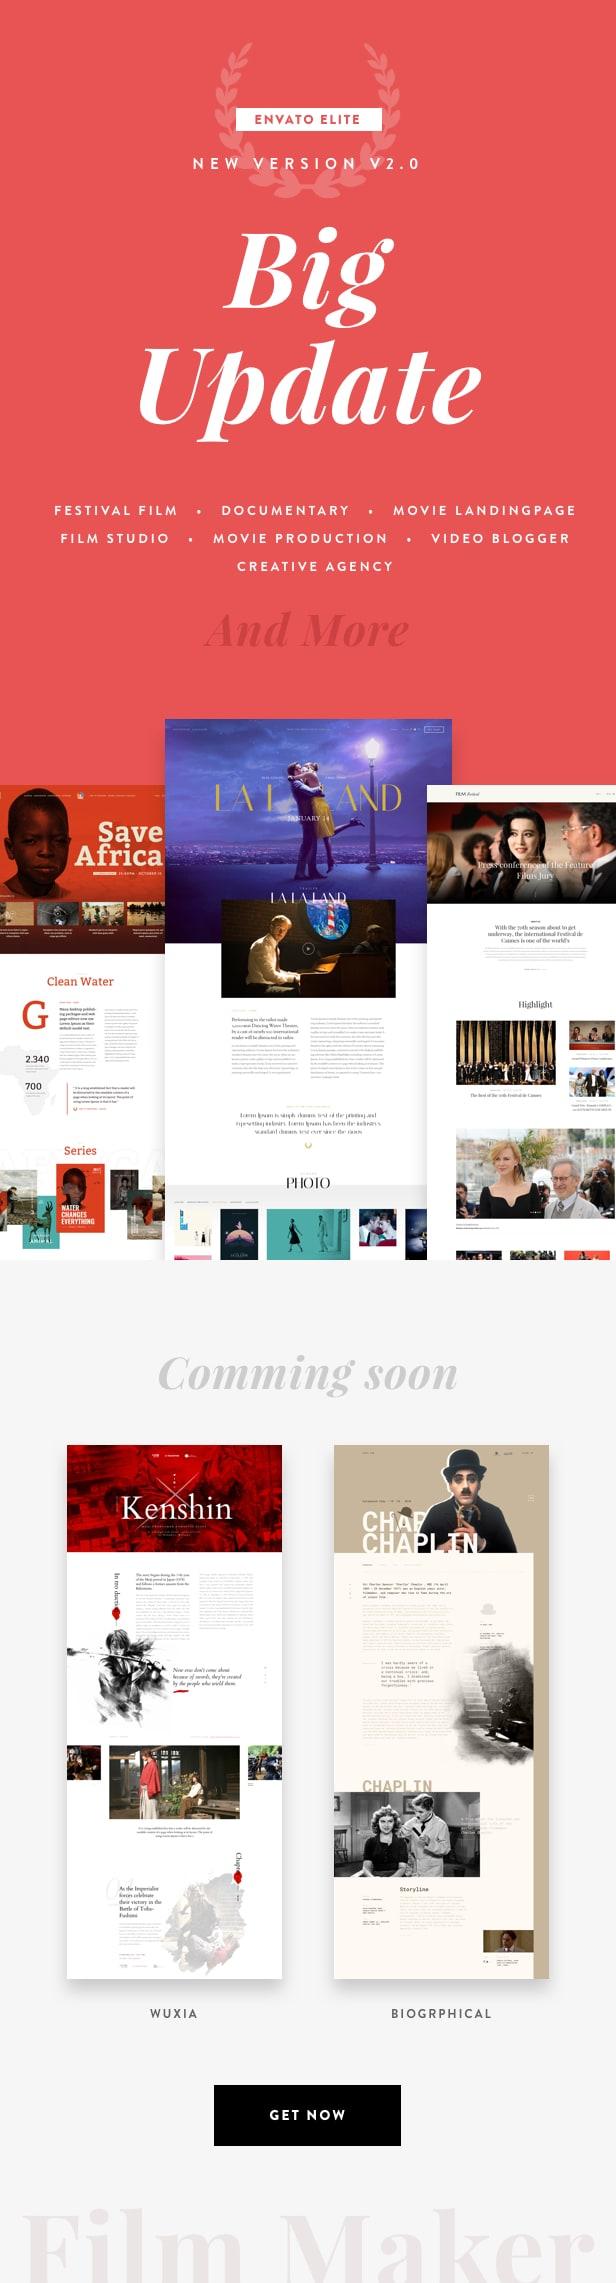 Wordpress Kreativ Template FilmMaker WordPress Theme: Film Studio - Movie Production - Video Blogger - Creative Agency